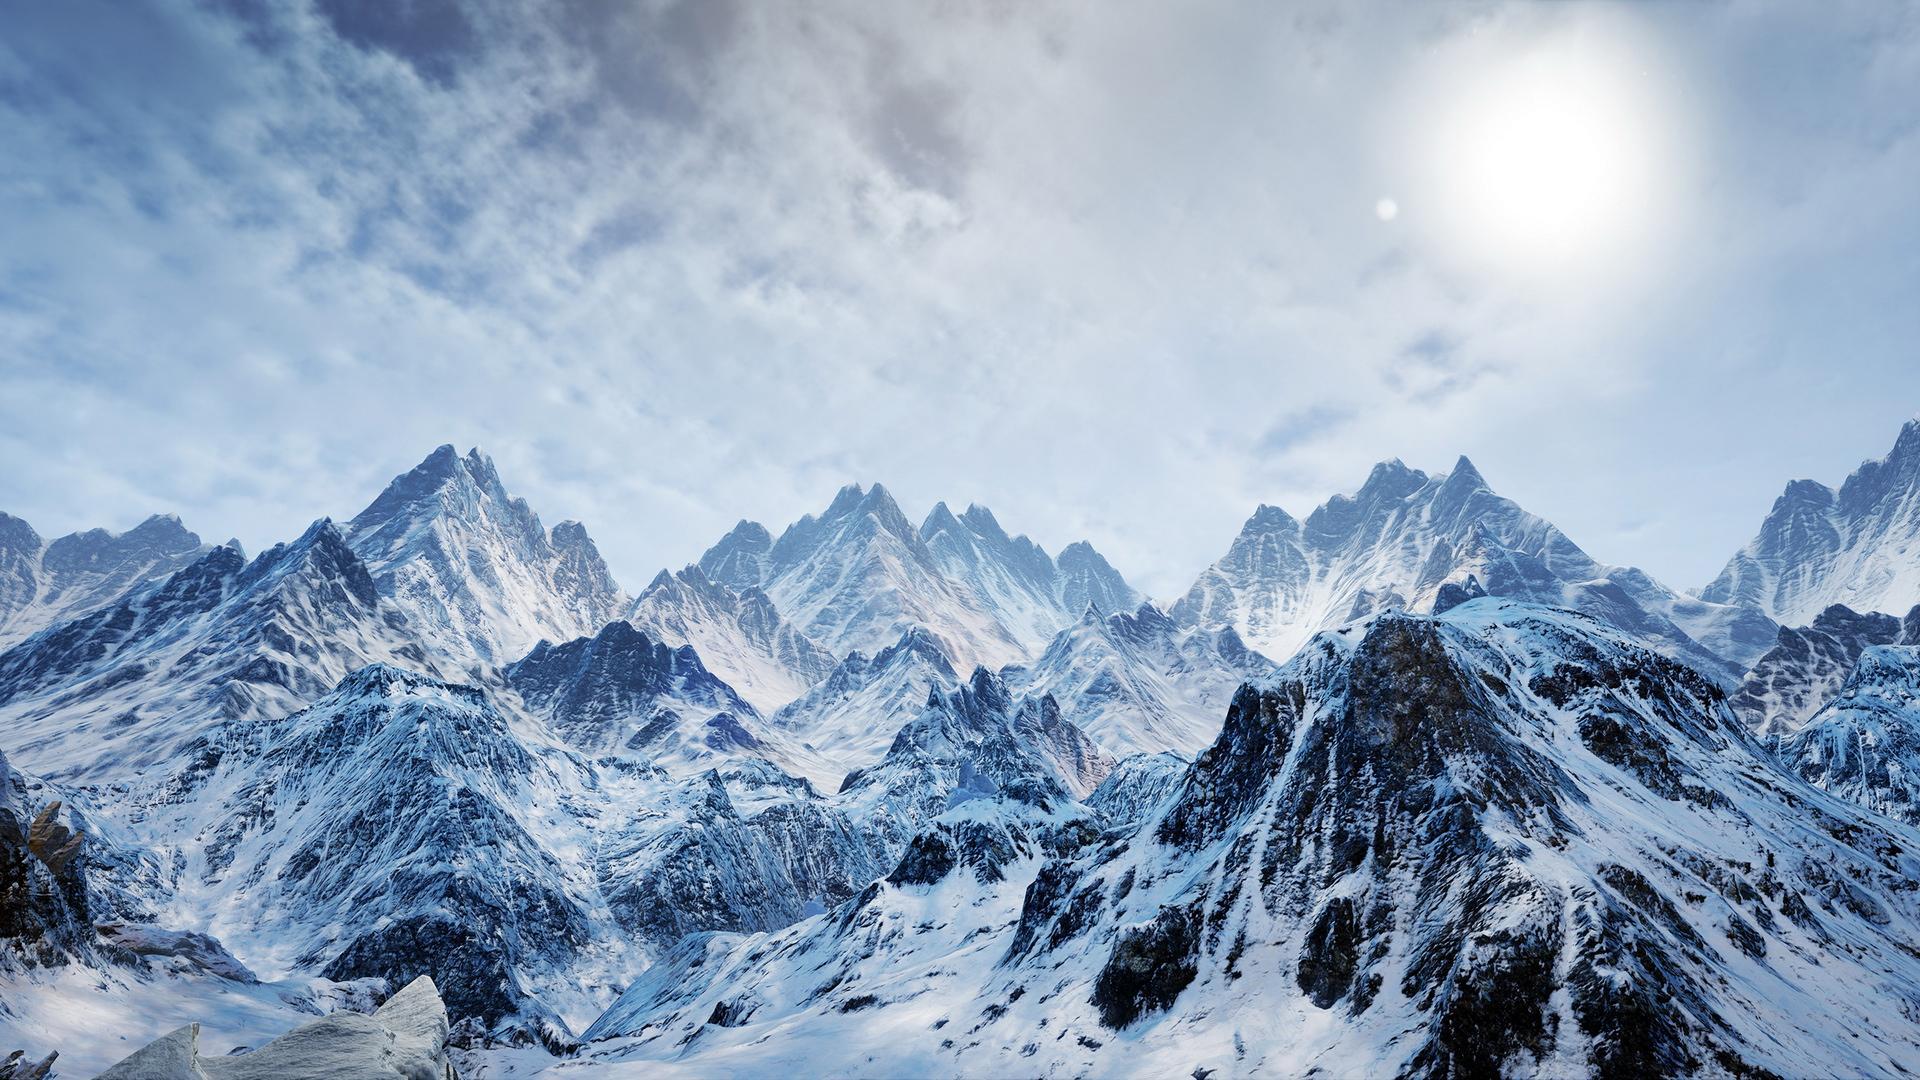 Snow Mountain 14100 Hdwpro